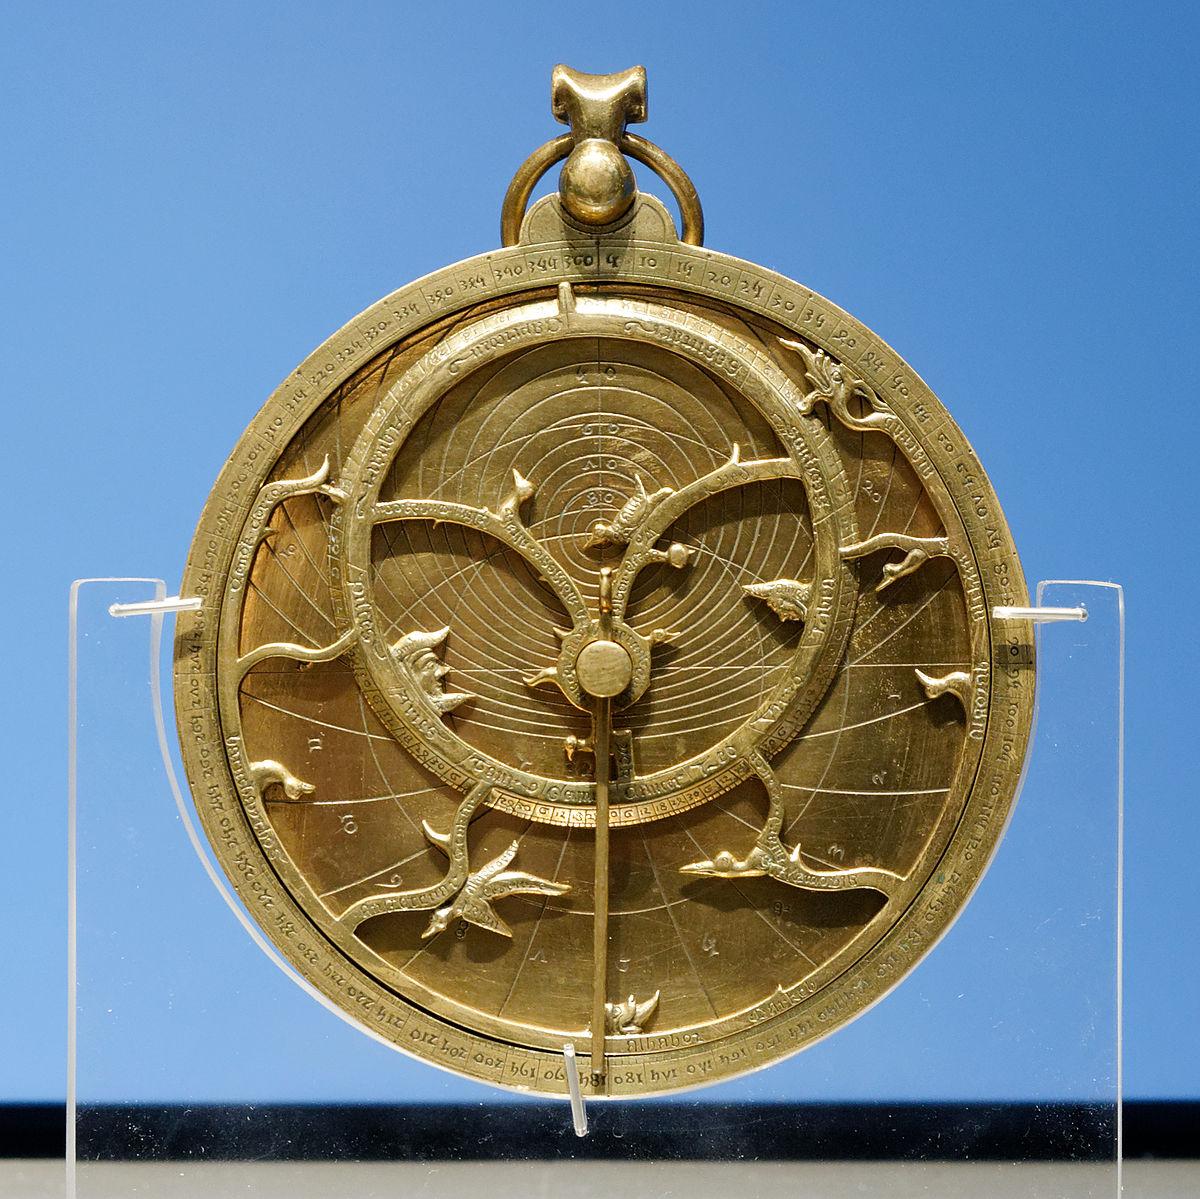 Jelle Van Riet Wikipedia a treatise on the astrolabe - wikipedia